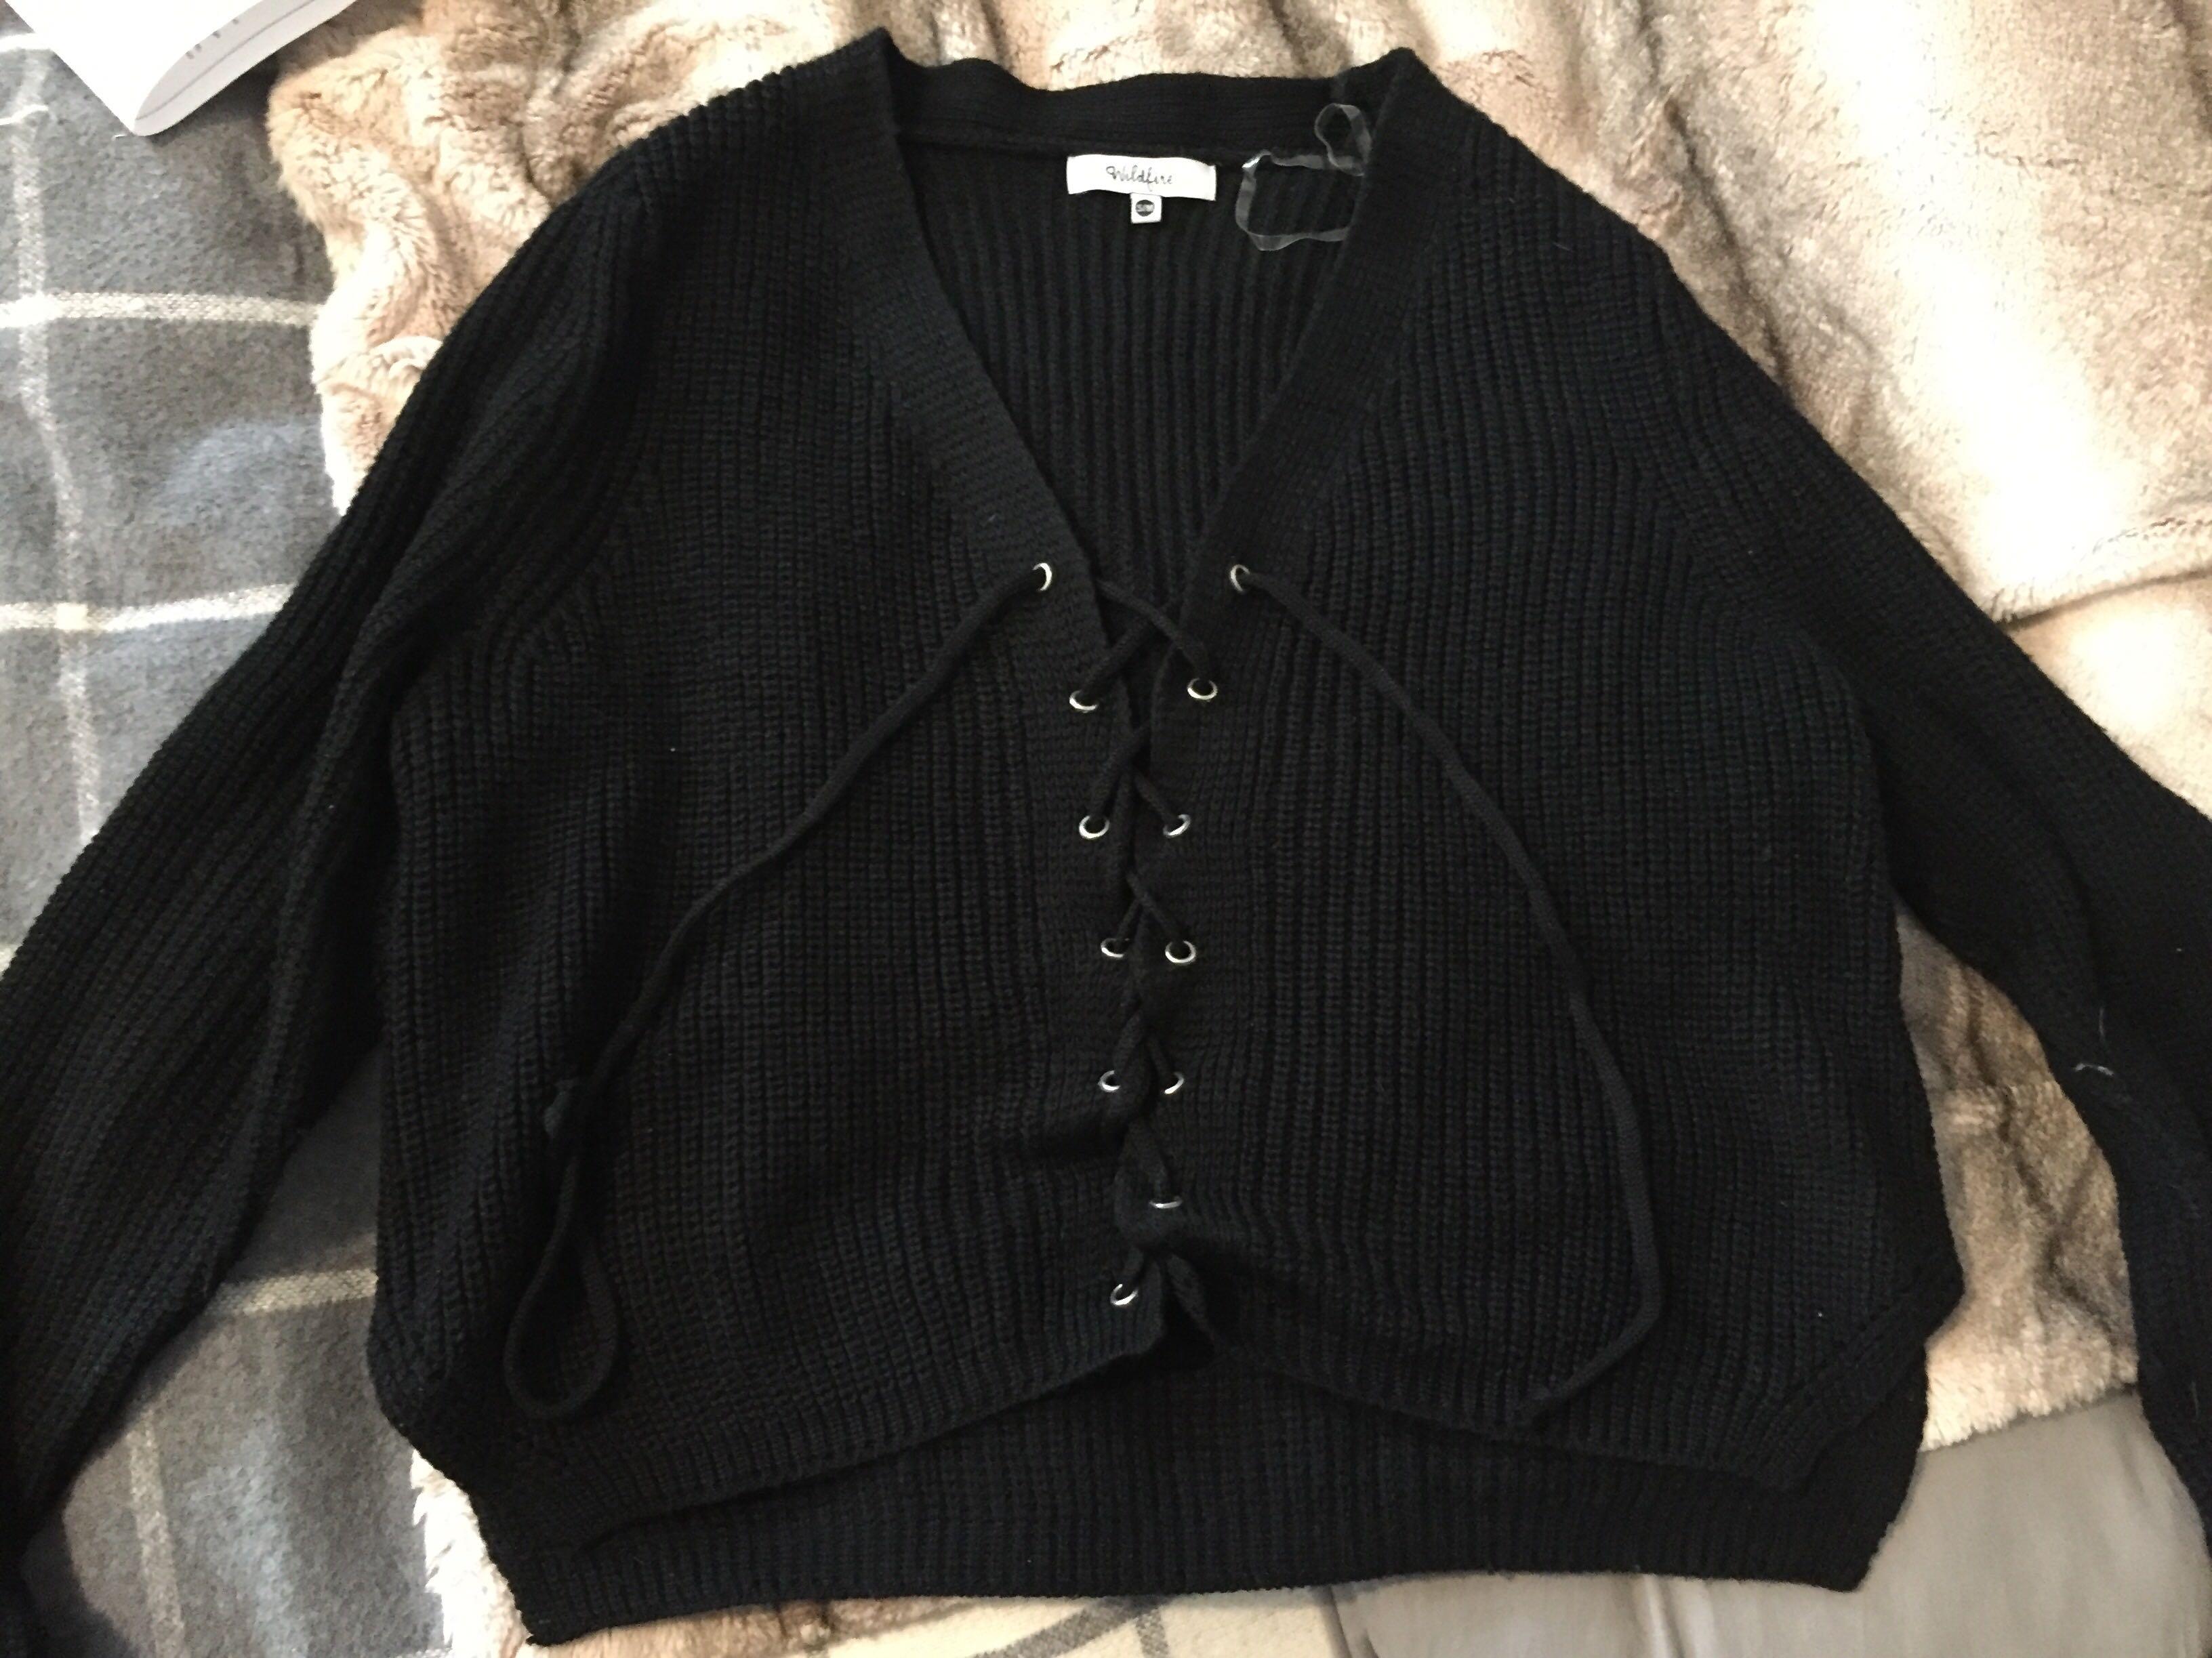 Wildfire knit long sleeve sweater/shirt